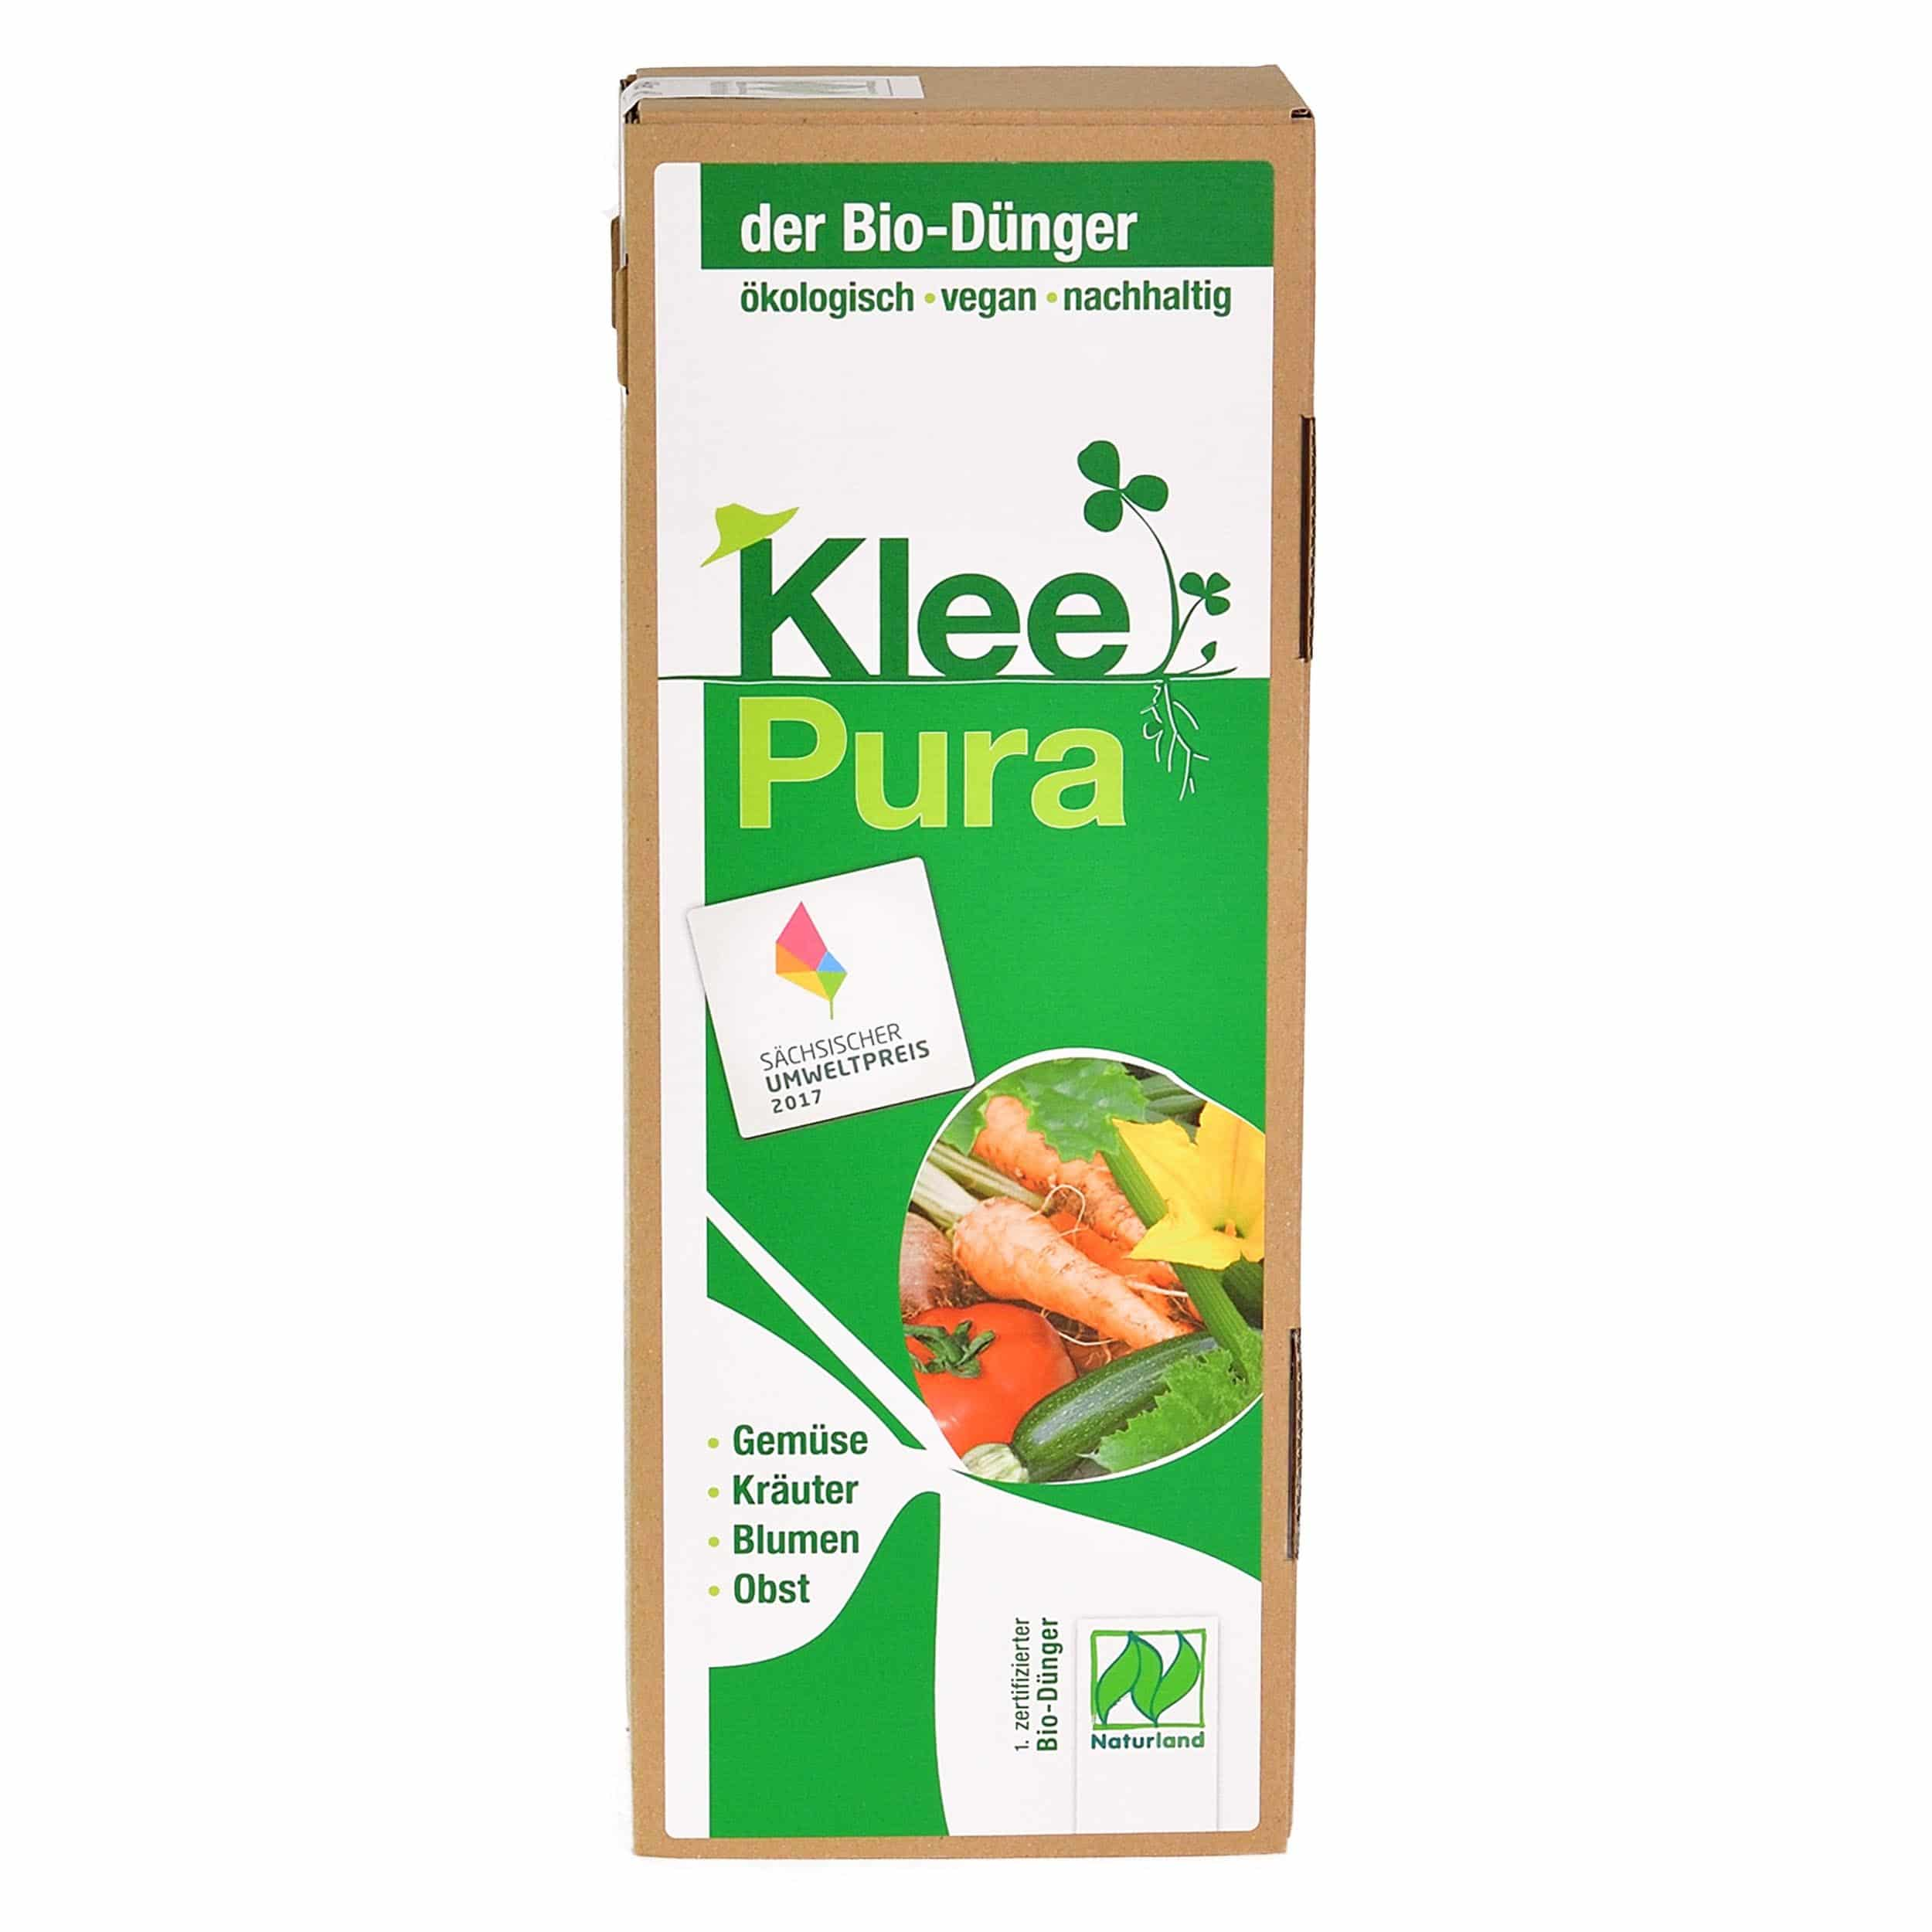 Veganer Bio-Dünger aus Bioklee 1,75 kg